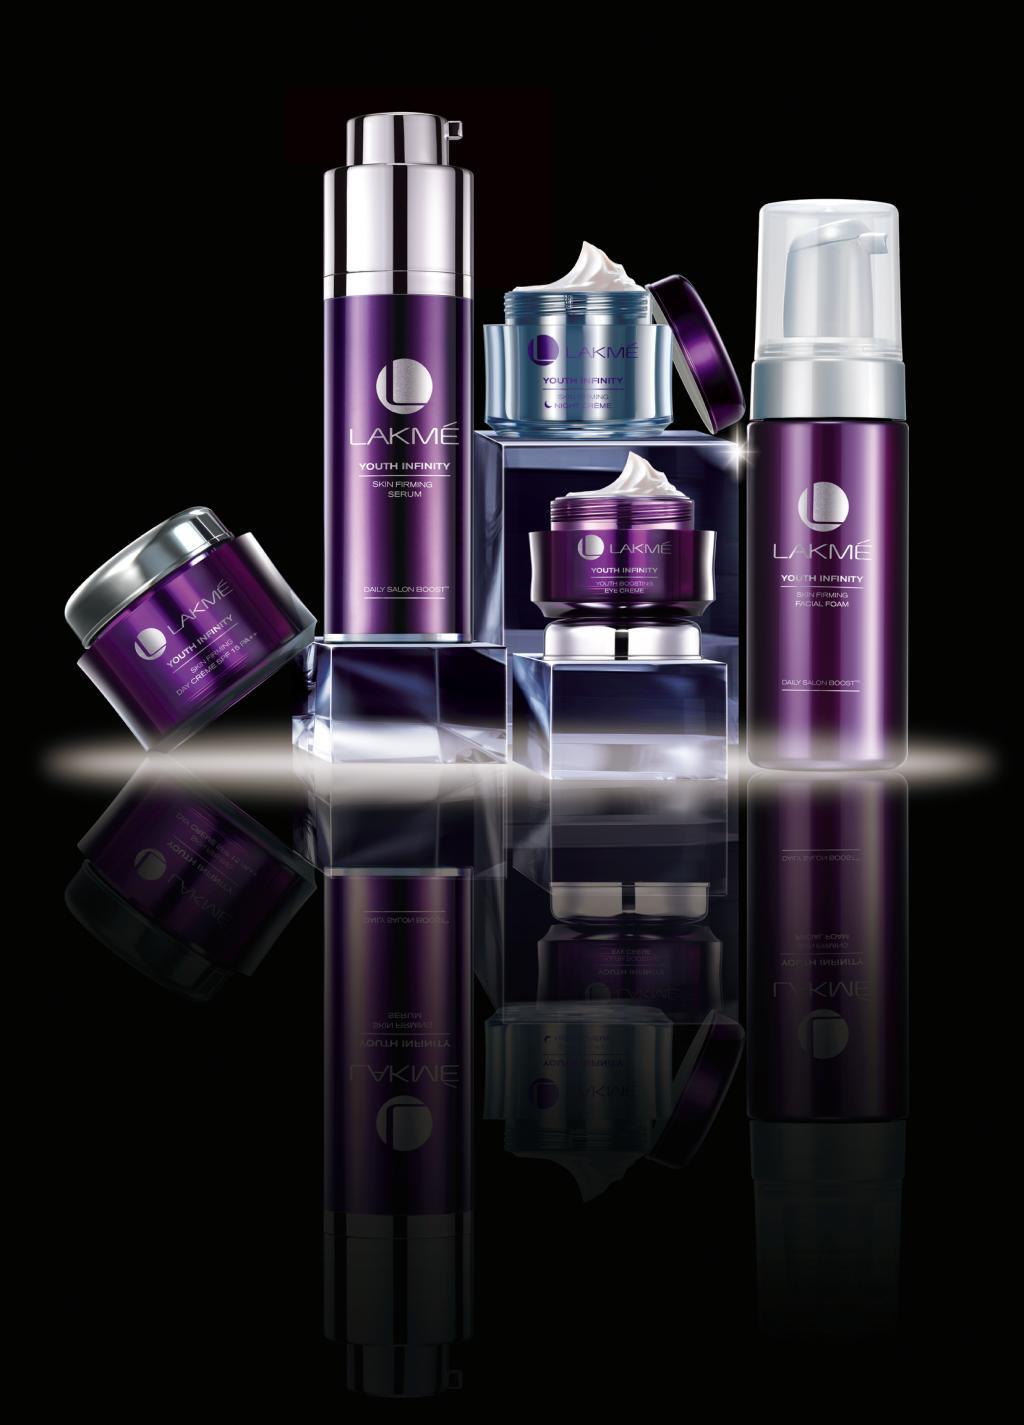 Best Skin Cream: Lakme Youth Infinity Skin Firming Range